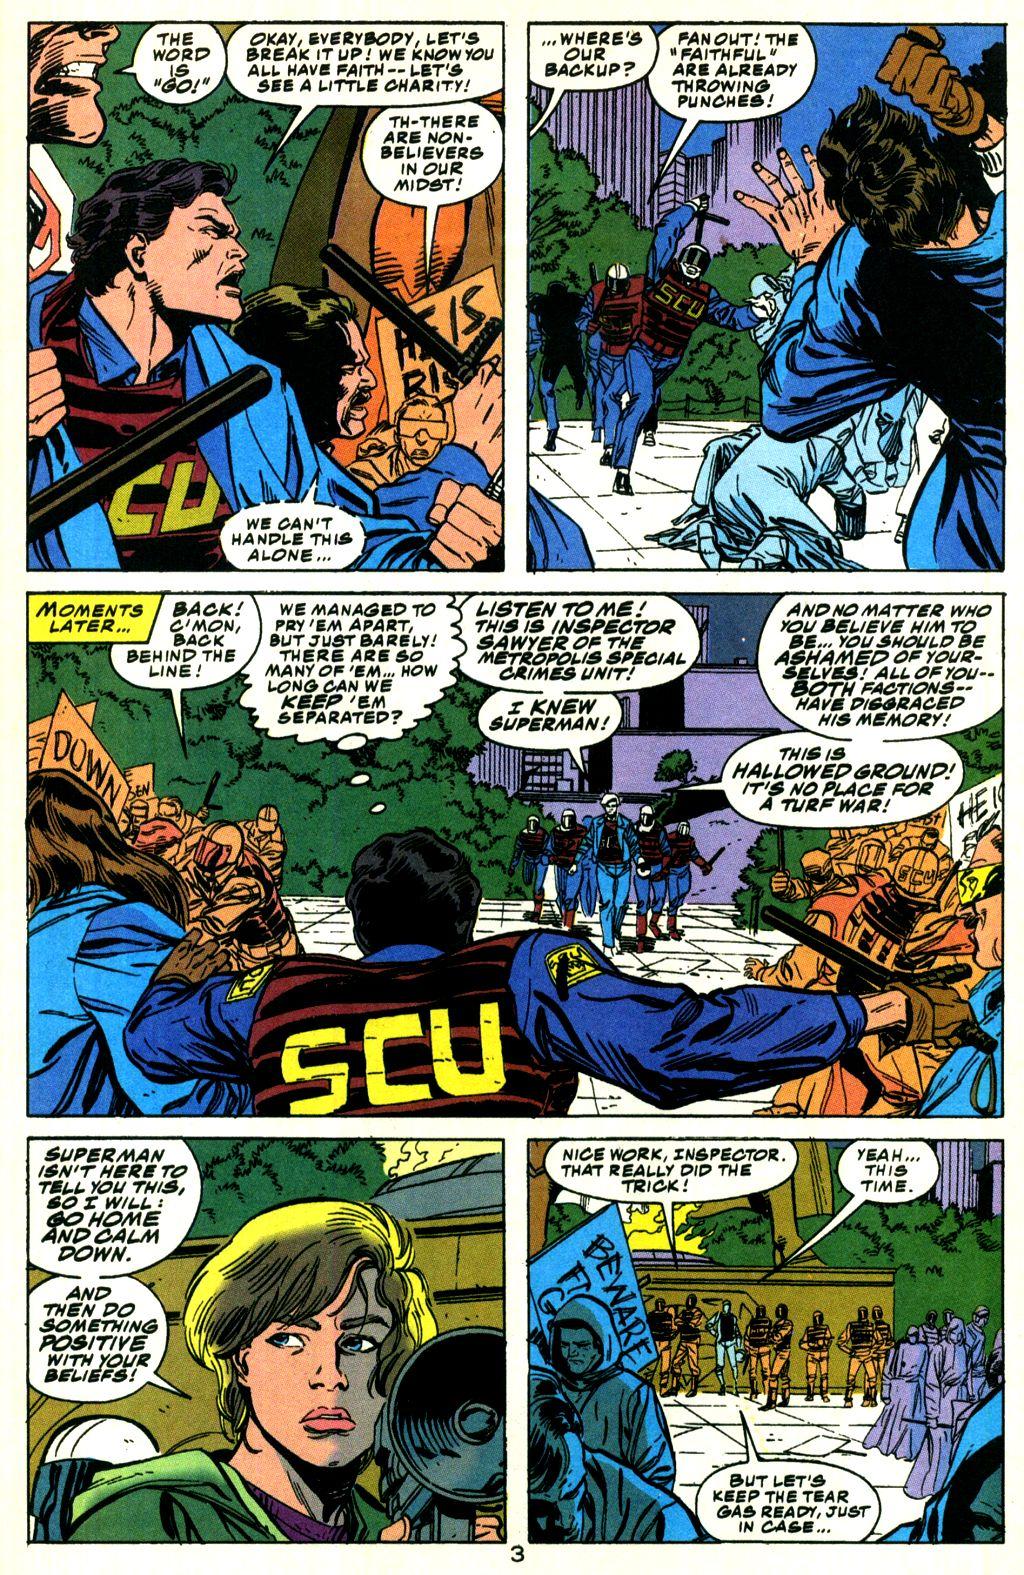 Action Comics (1938) 690 Page 3